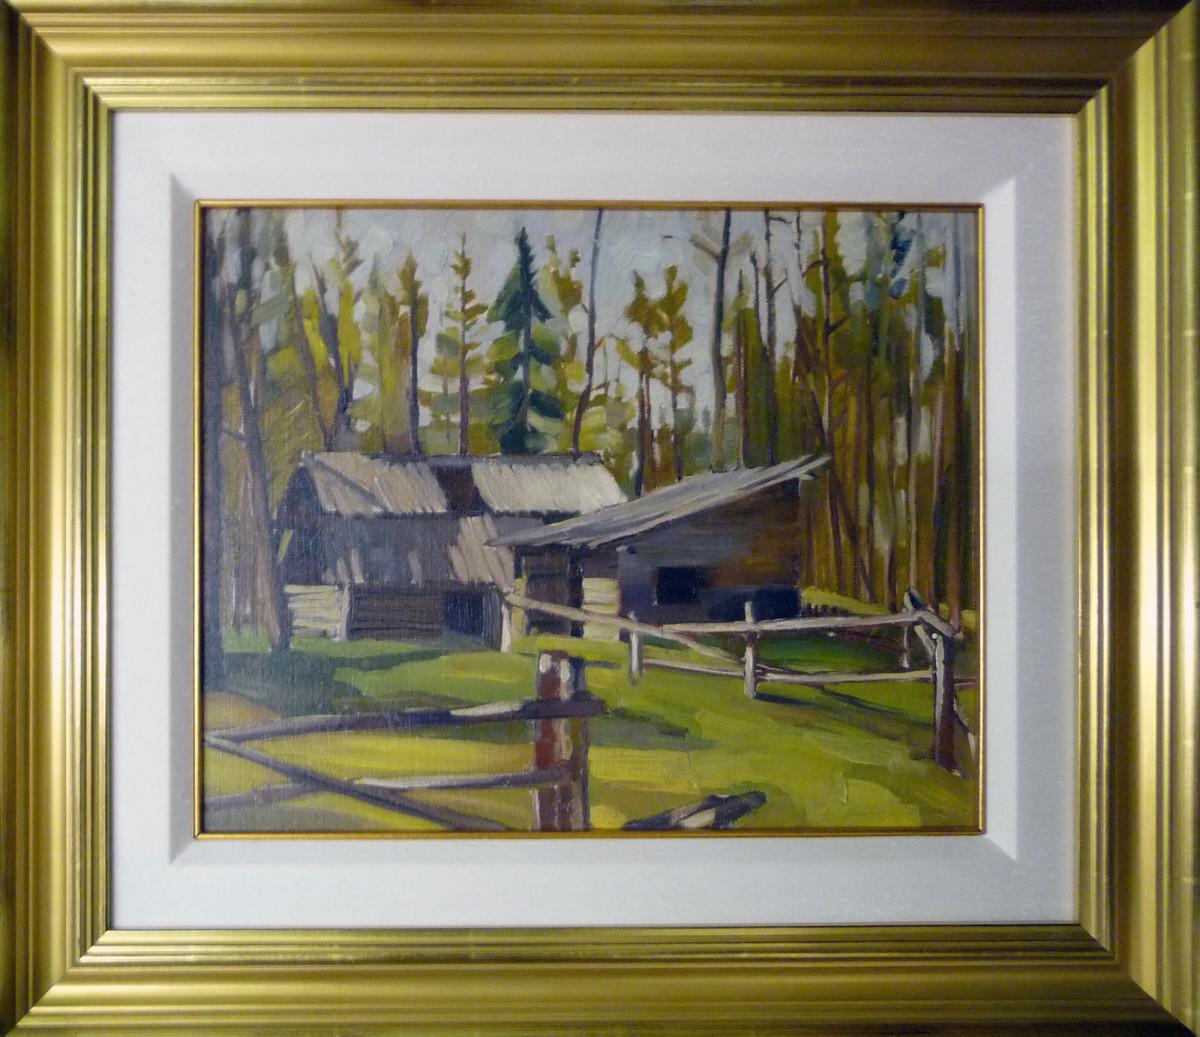 0234 - Old Shacks, Whitecourt Alberta by Llewellyn Petley-Jones (1908-1986)